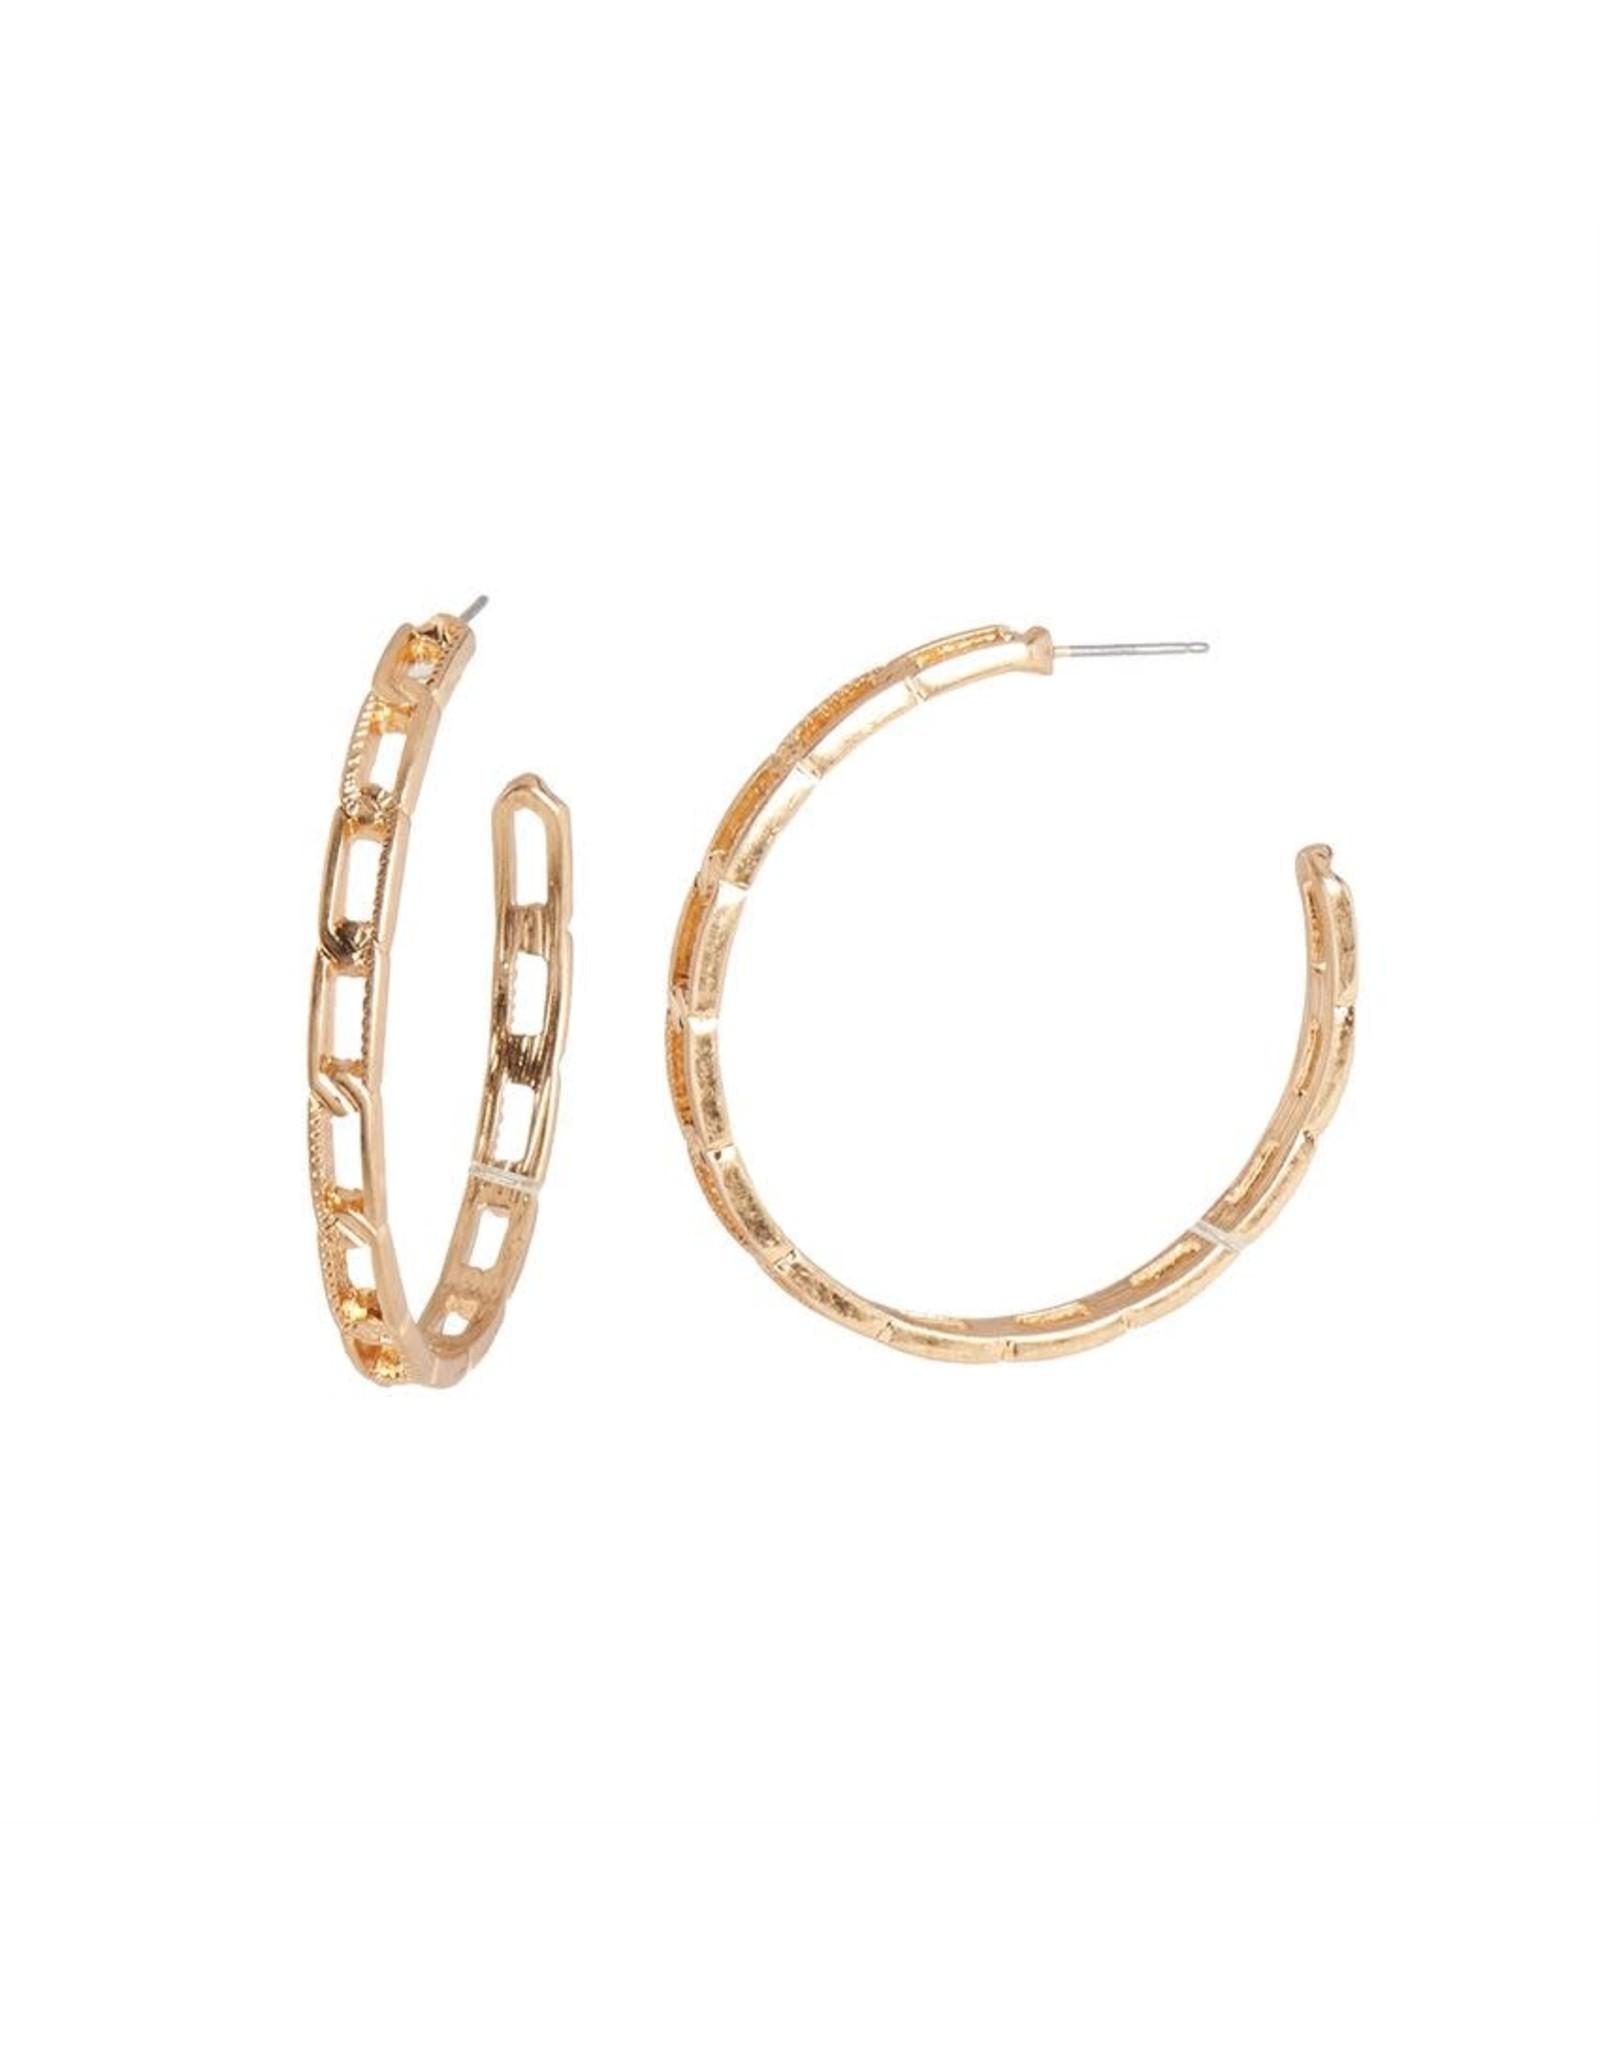 TGB / Good Bead ANTIQUE GOLD CHAIN HOOP EARRING